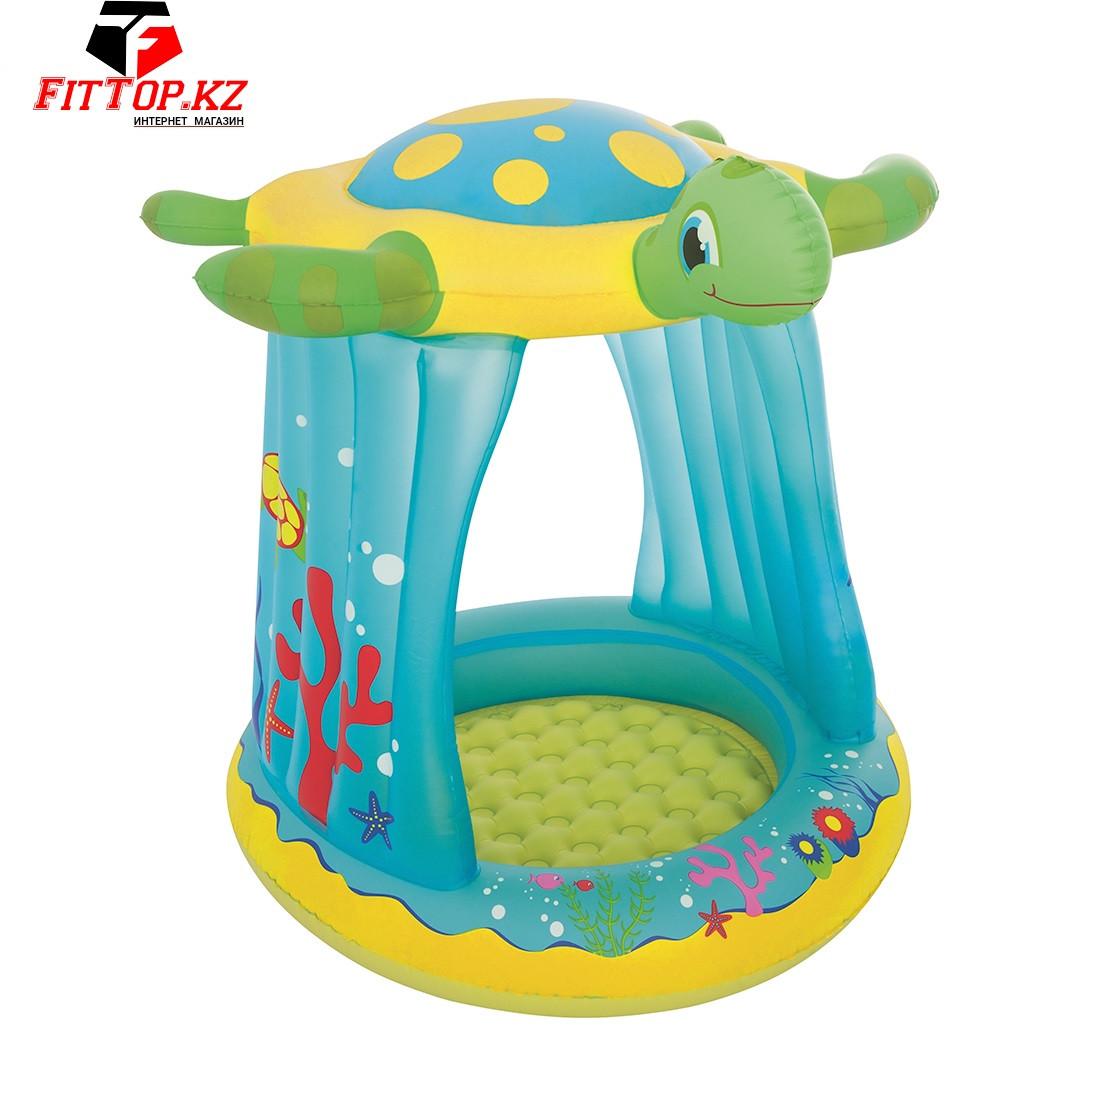 Детский надувной бассейн Turtle Totz 109 х 96 х 104 см, BESTWAY, 52219